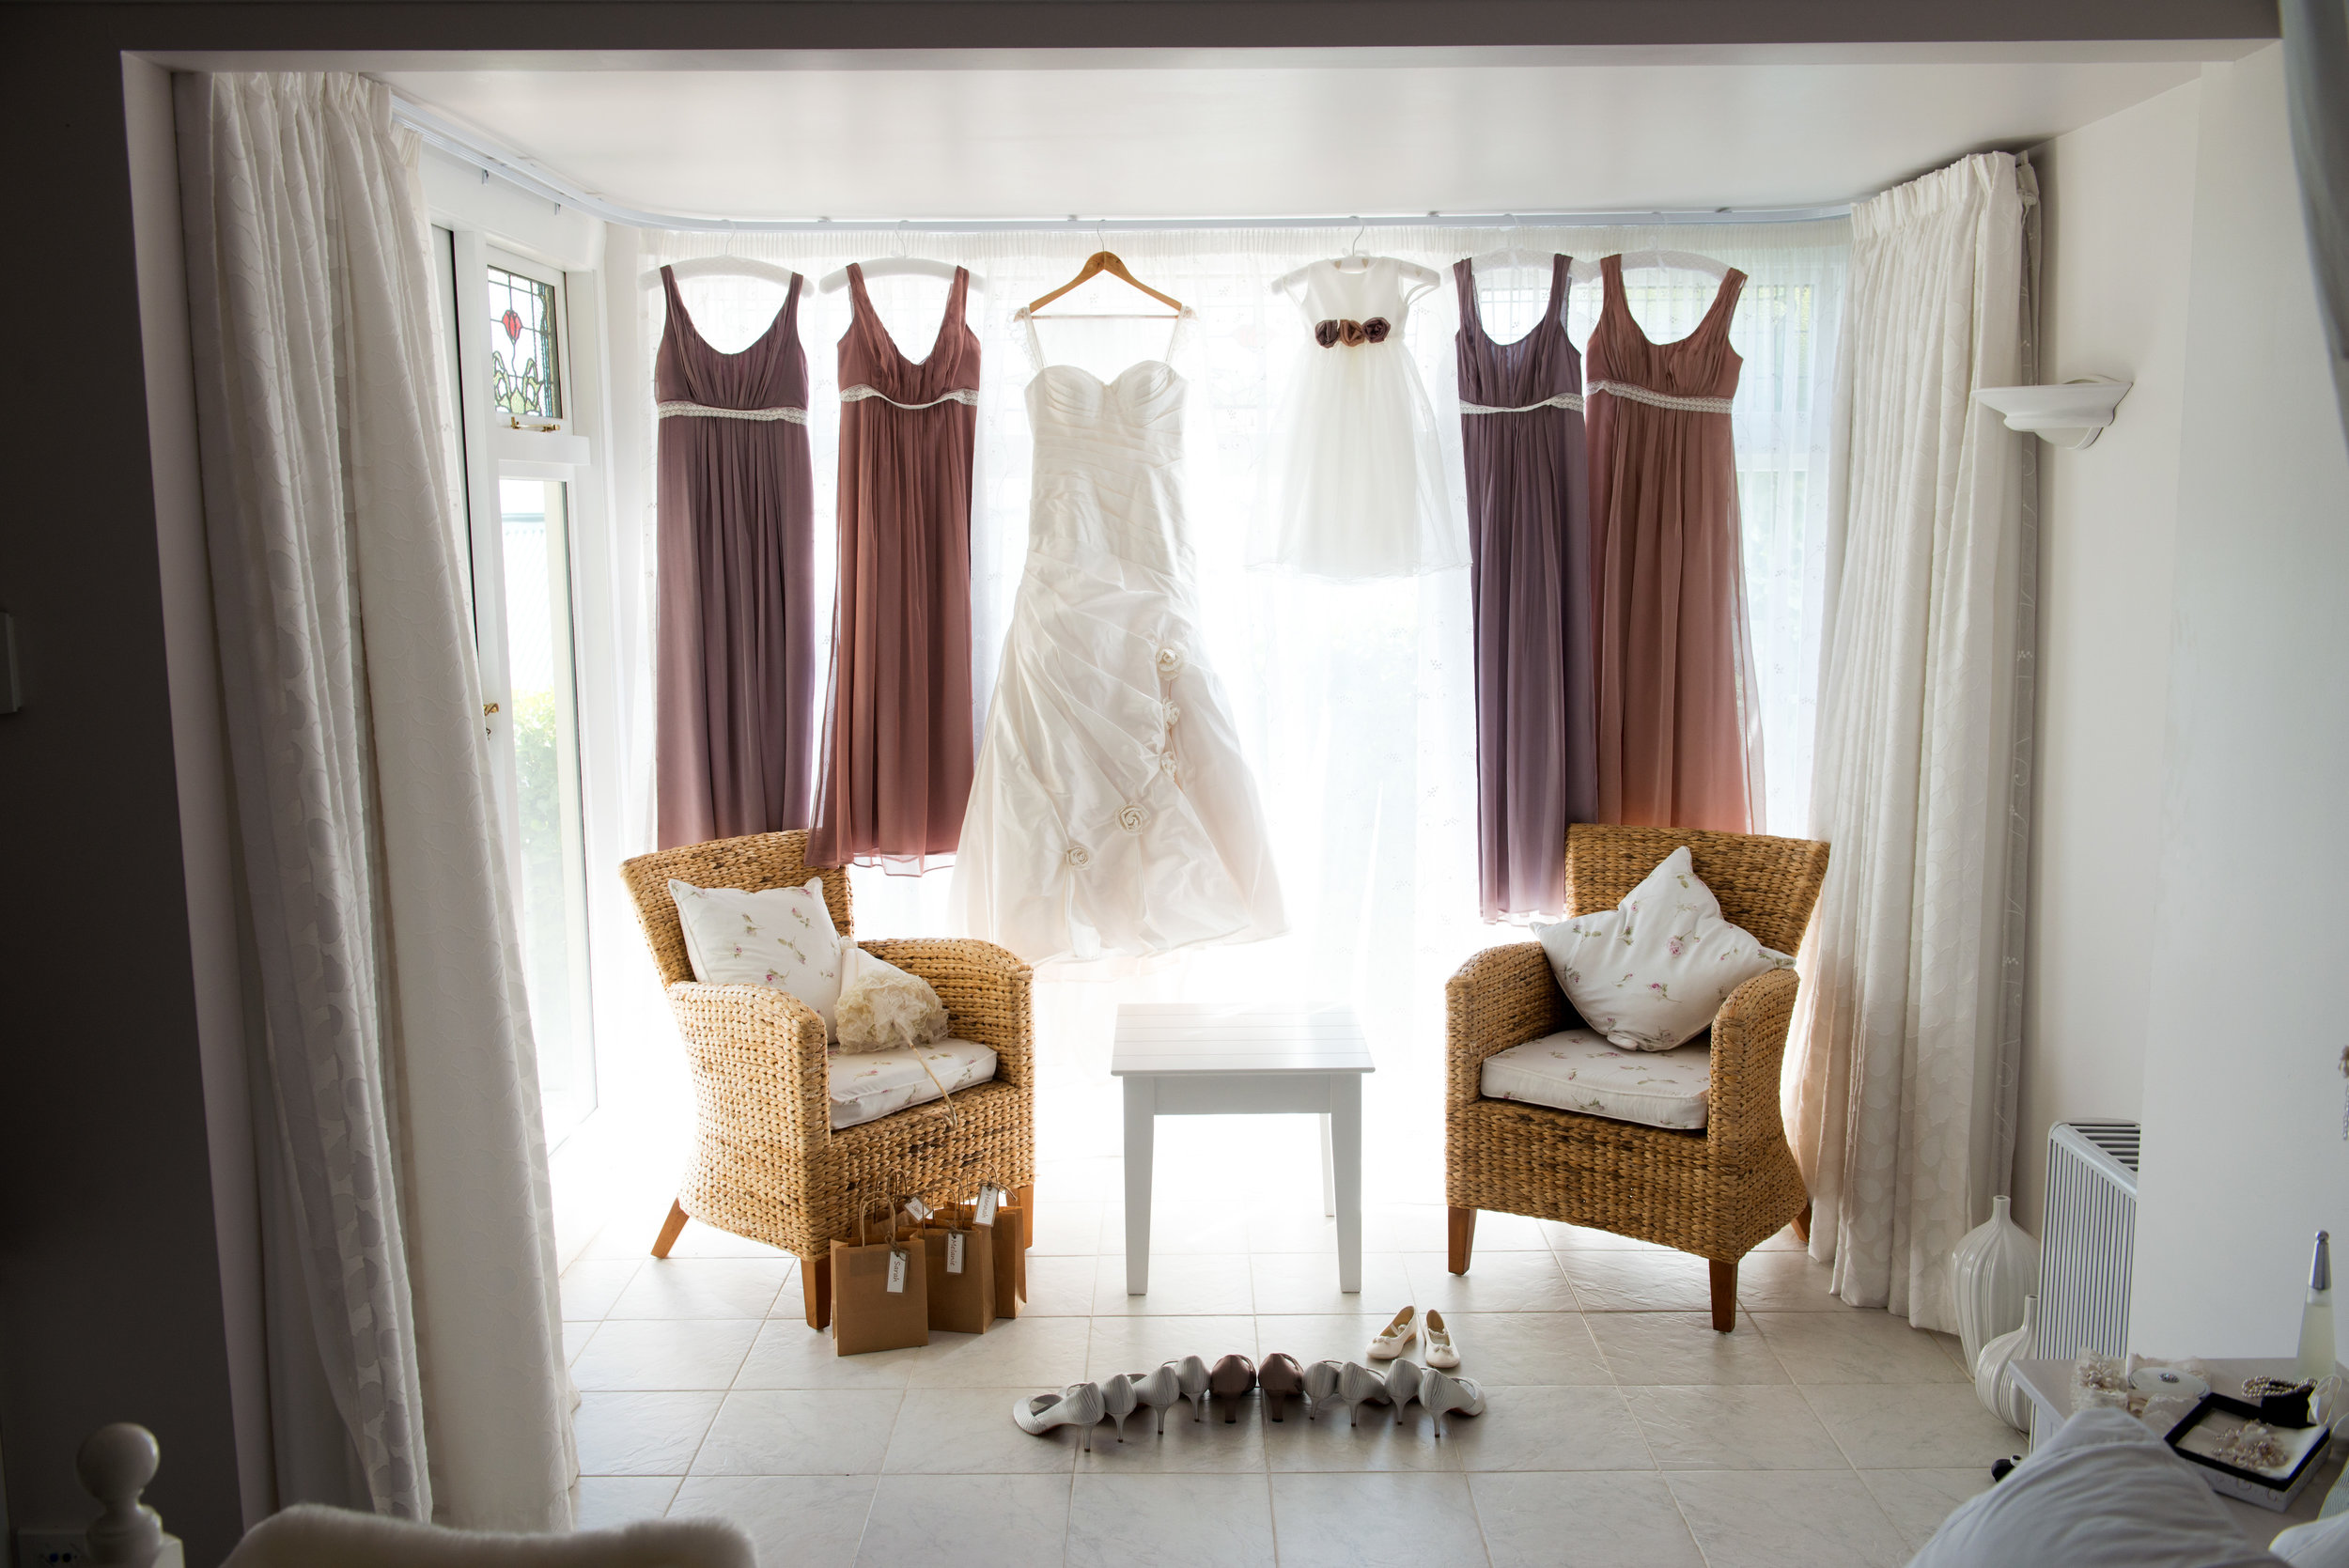 Katrina - silk dupion, maids, satin and chiffon - South Canterbury Bridal - Frank Visser Photography